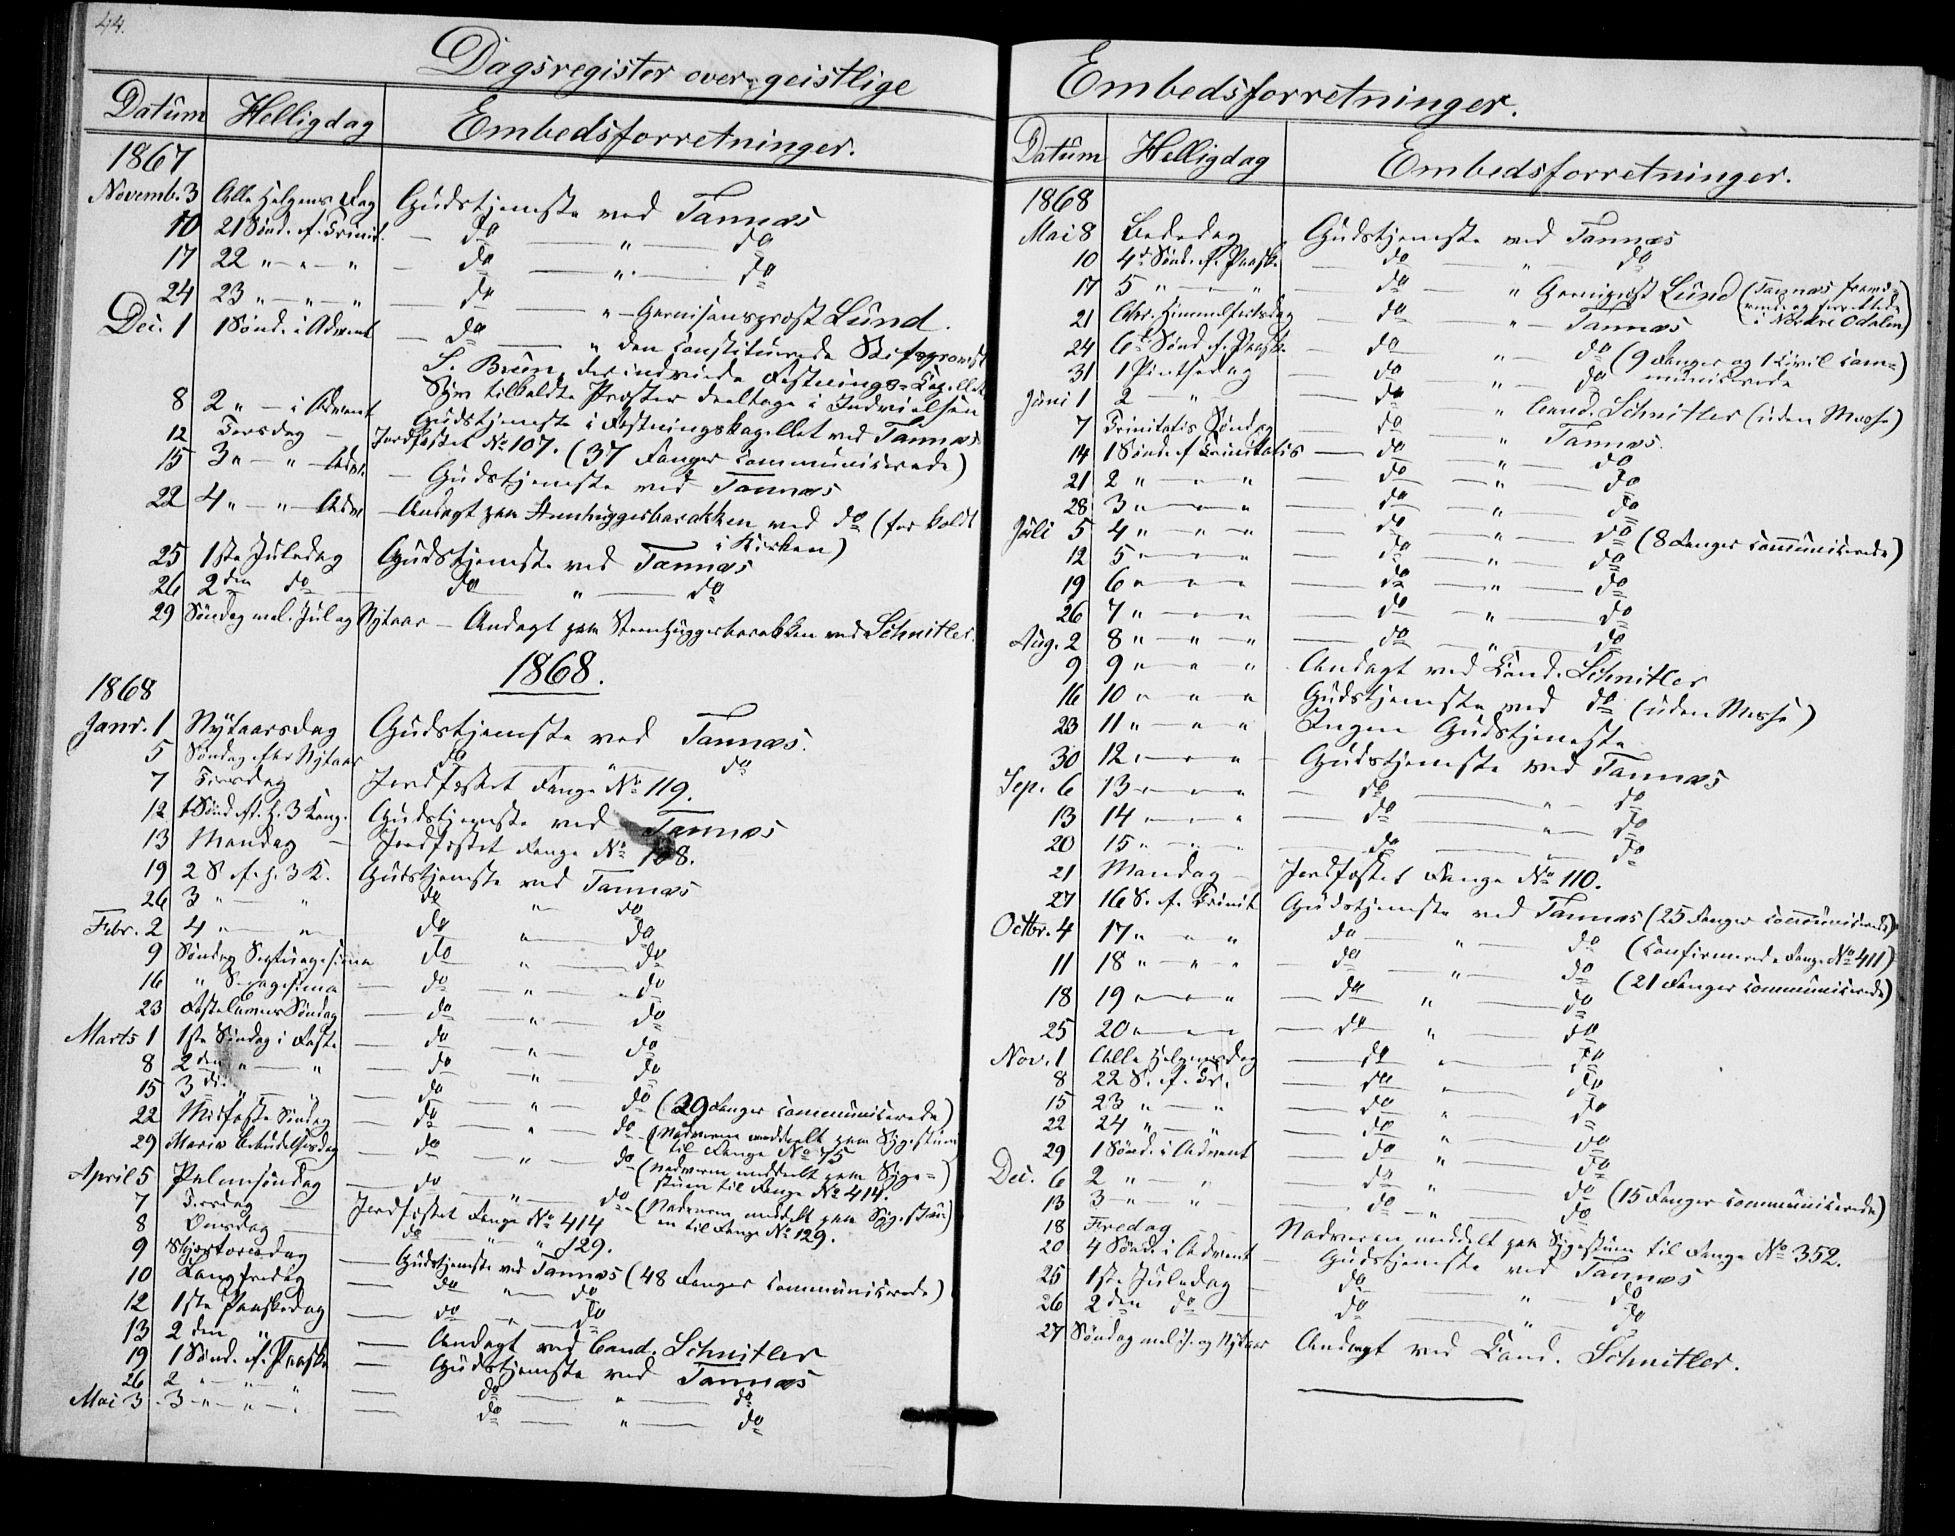 SAO, Akershus festnings slaveri Kirkebøker, F/Fa/L0002: Ministerialbok nr. 2, 1852-1883, s. 44